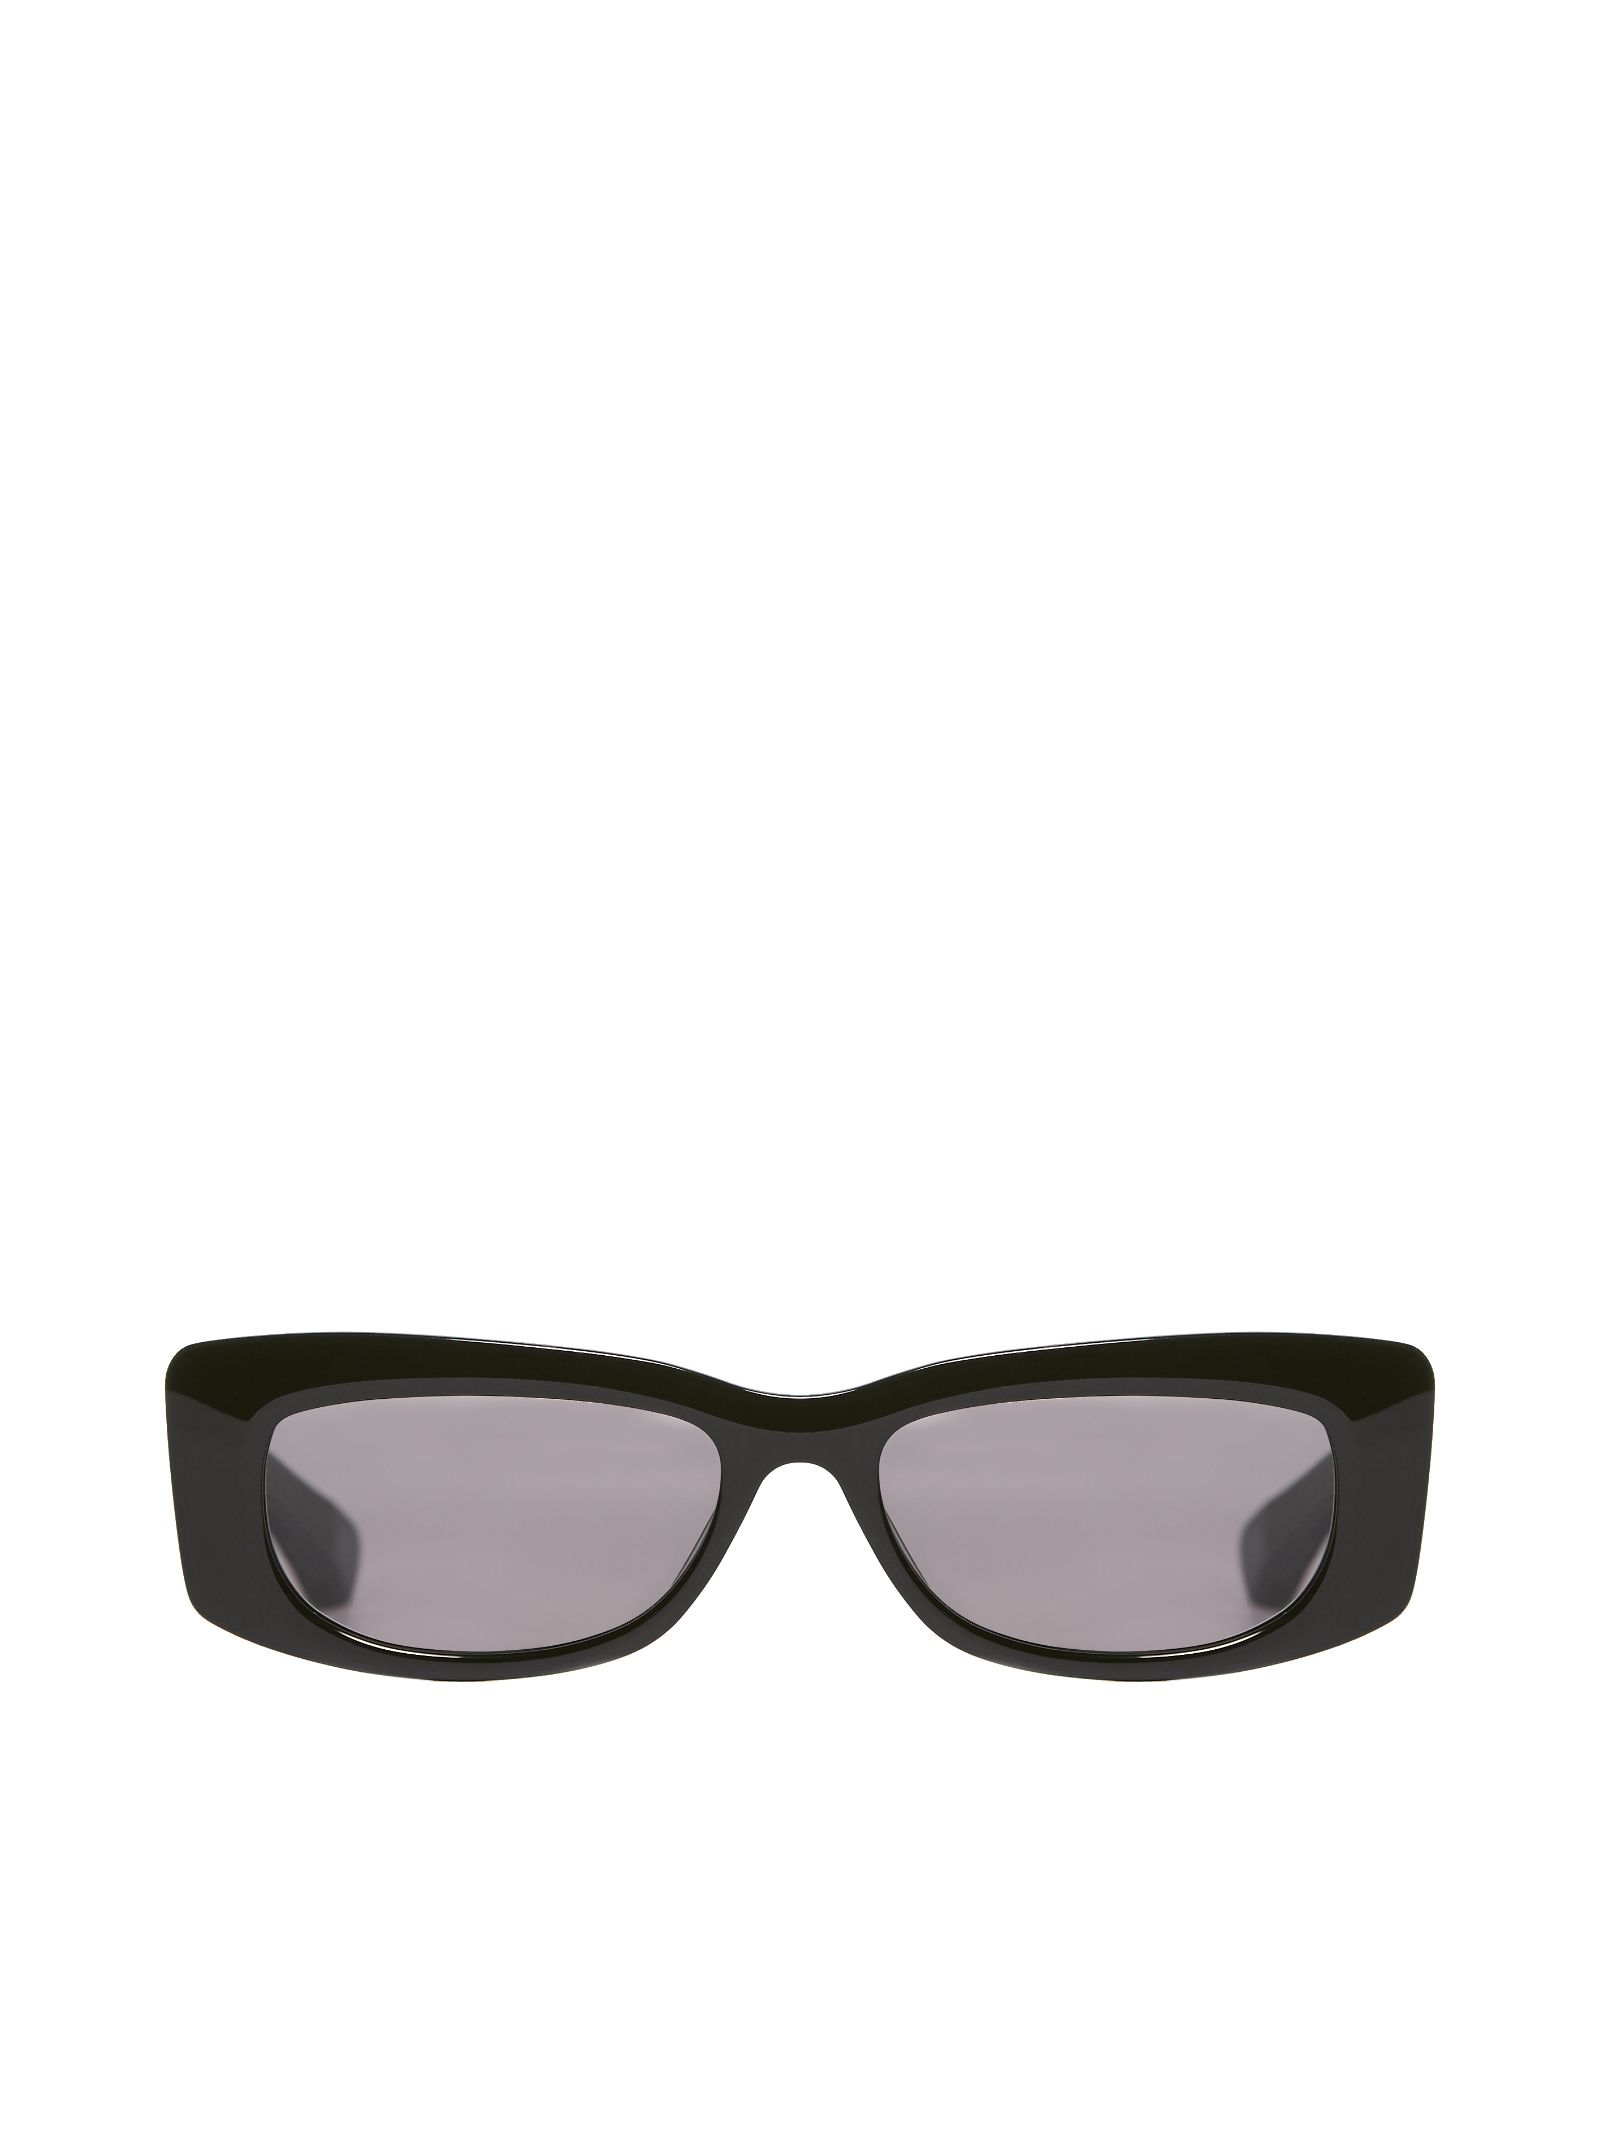 CHRISTIAN ROTH Dreesen Sunglasses in Nero